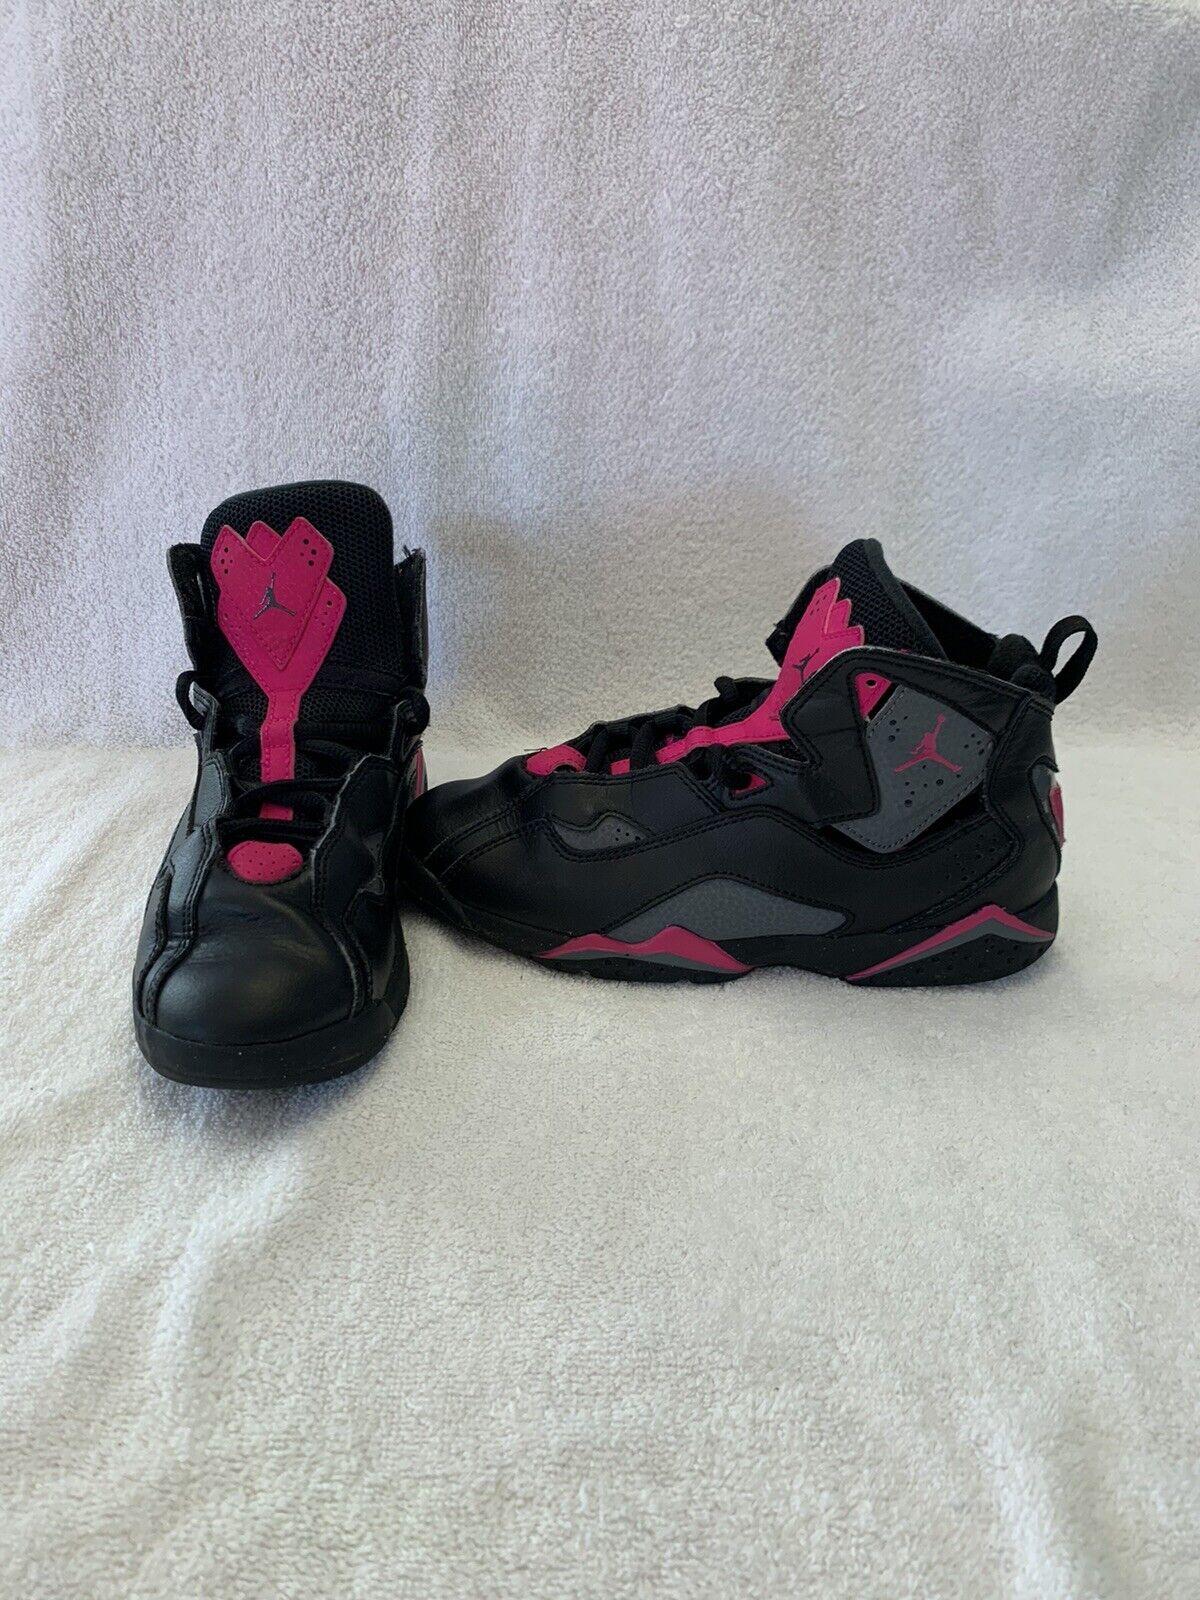 black pink shoes size